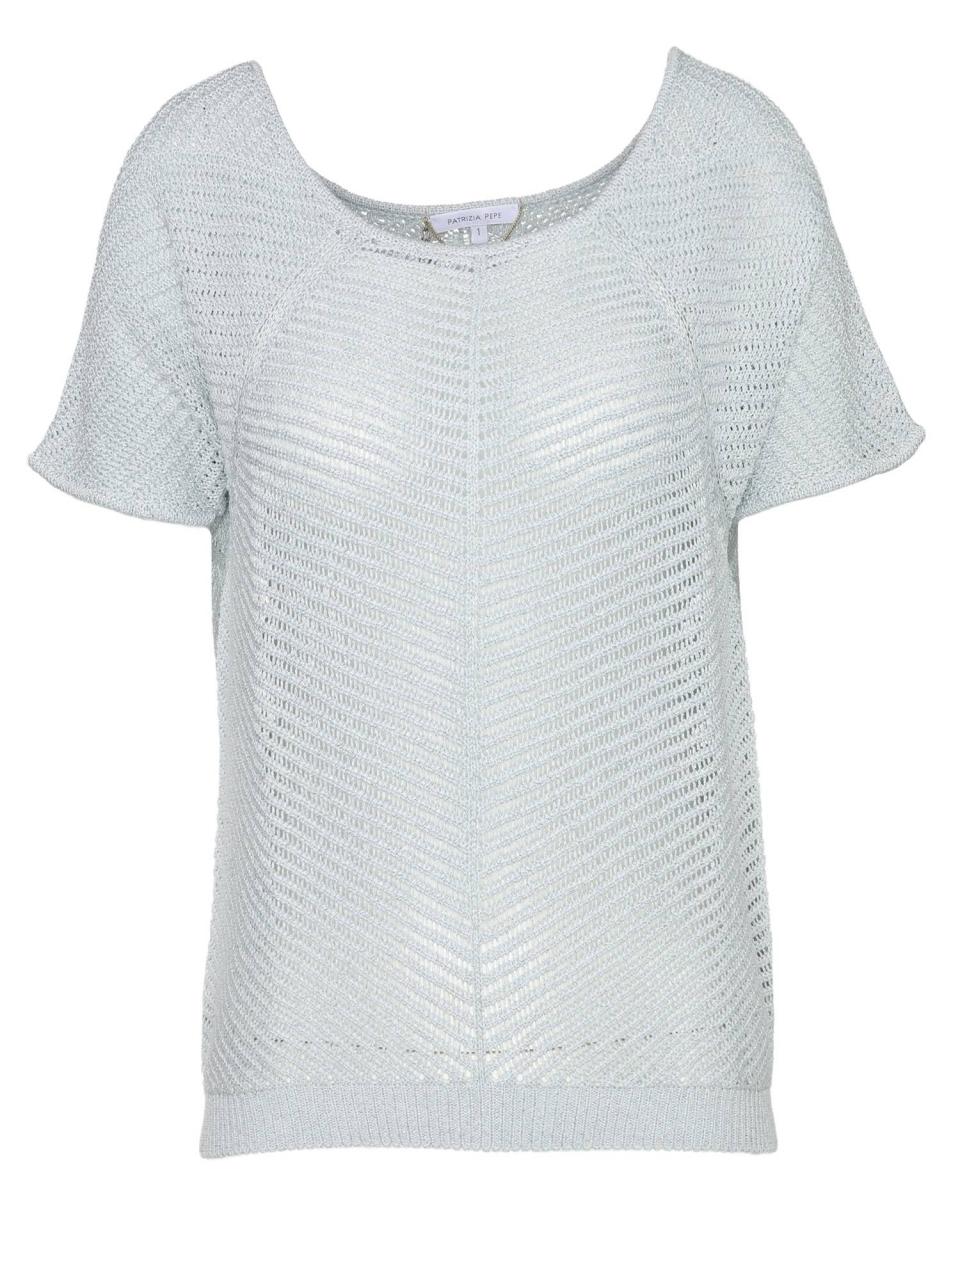 Patrizia Pepe T-Shirt mit Strick-Optik